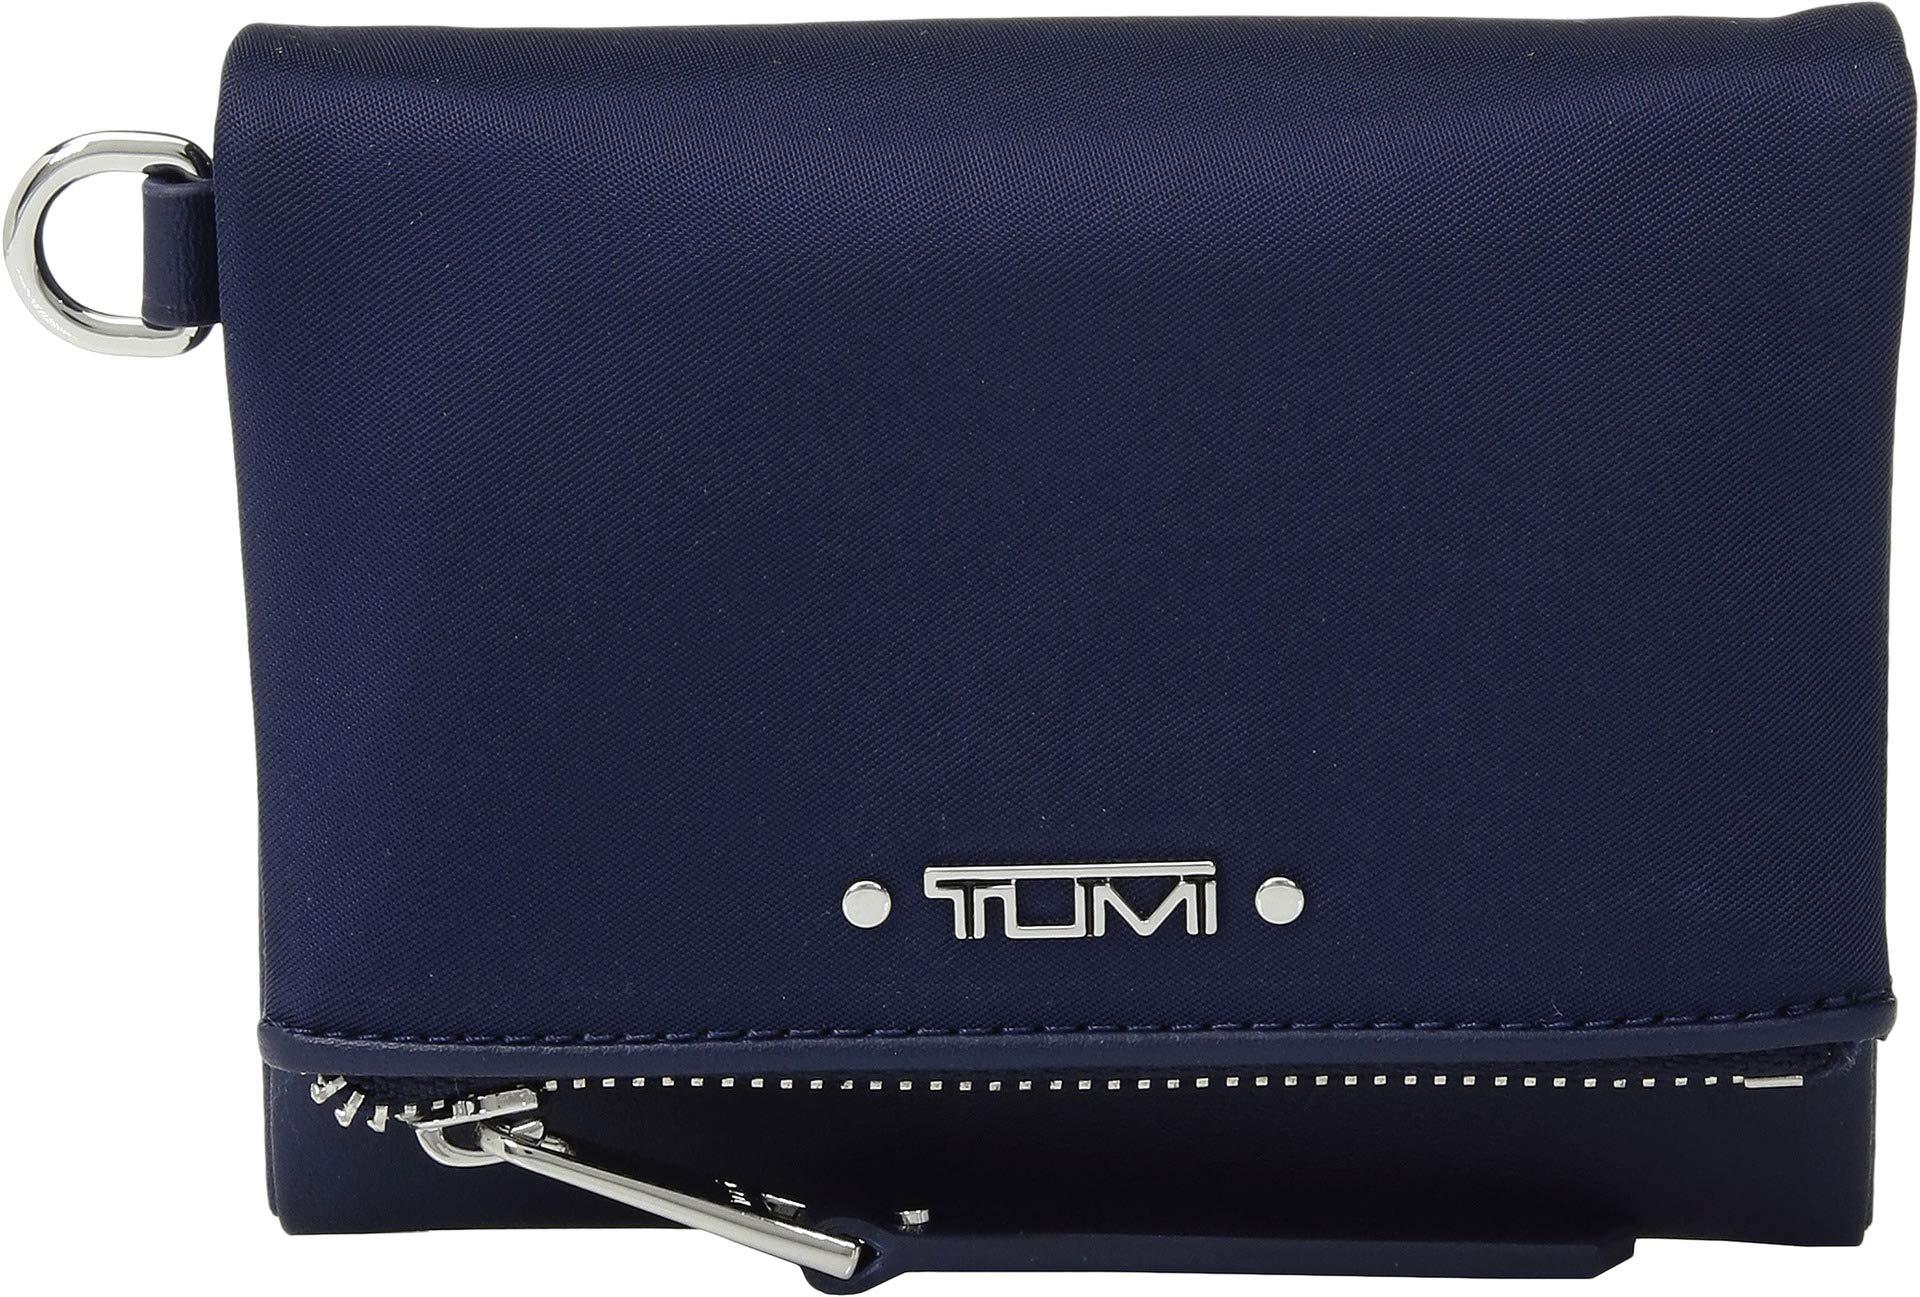 TUMI - Voyageur Flap Card Holder Case - Compact Wallet for Women - Ultramarine